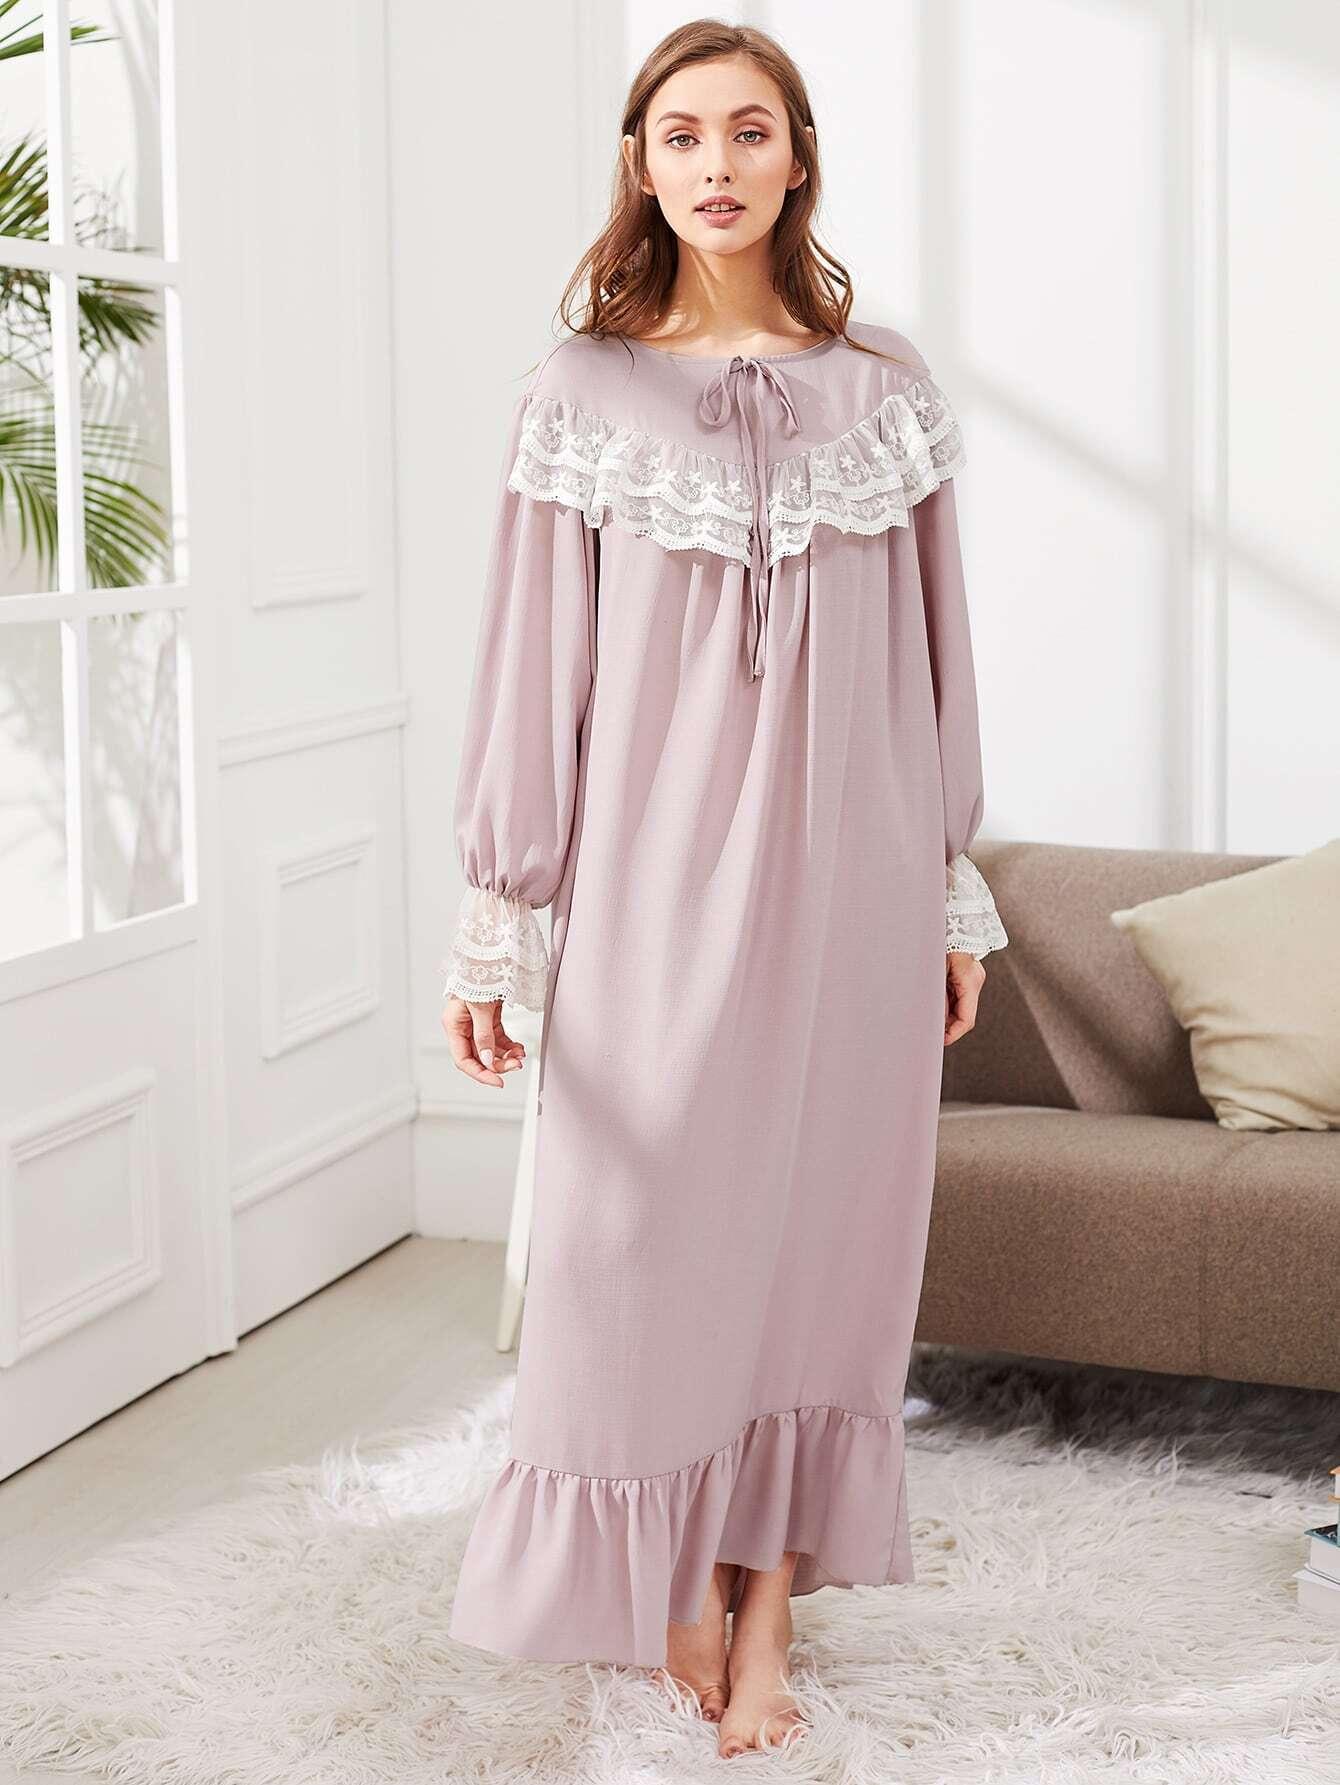 Lace Embellished Ruffle Hem Night Dress